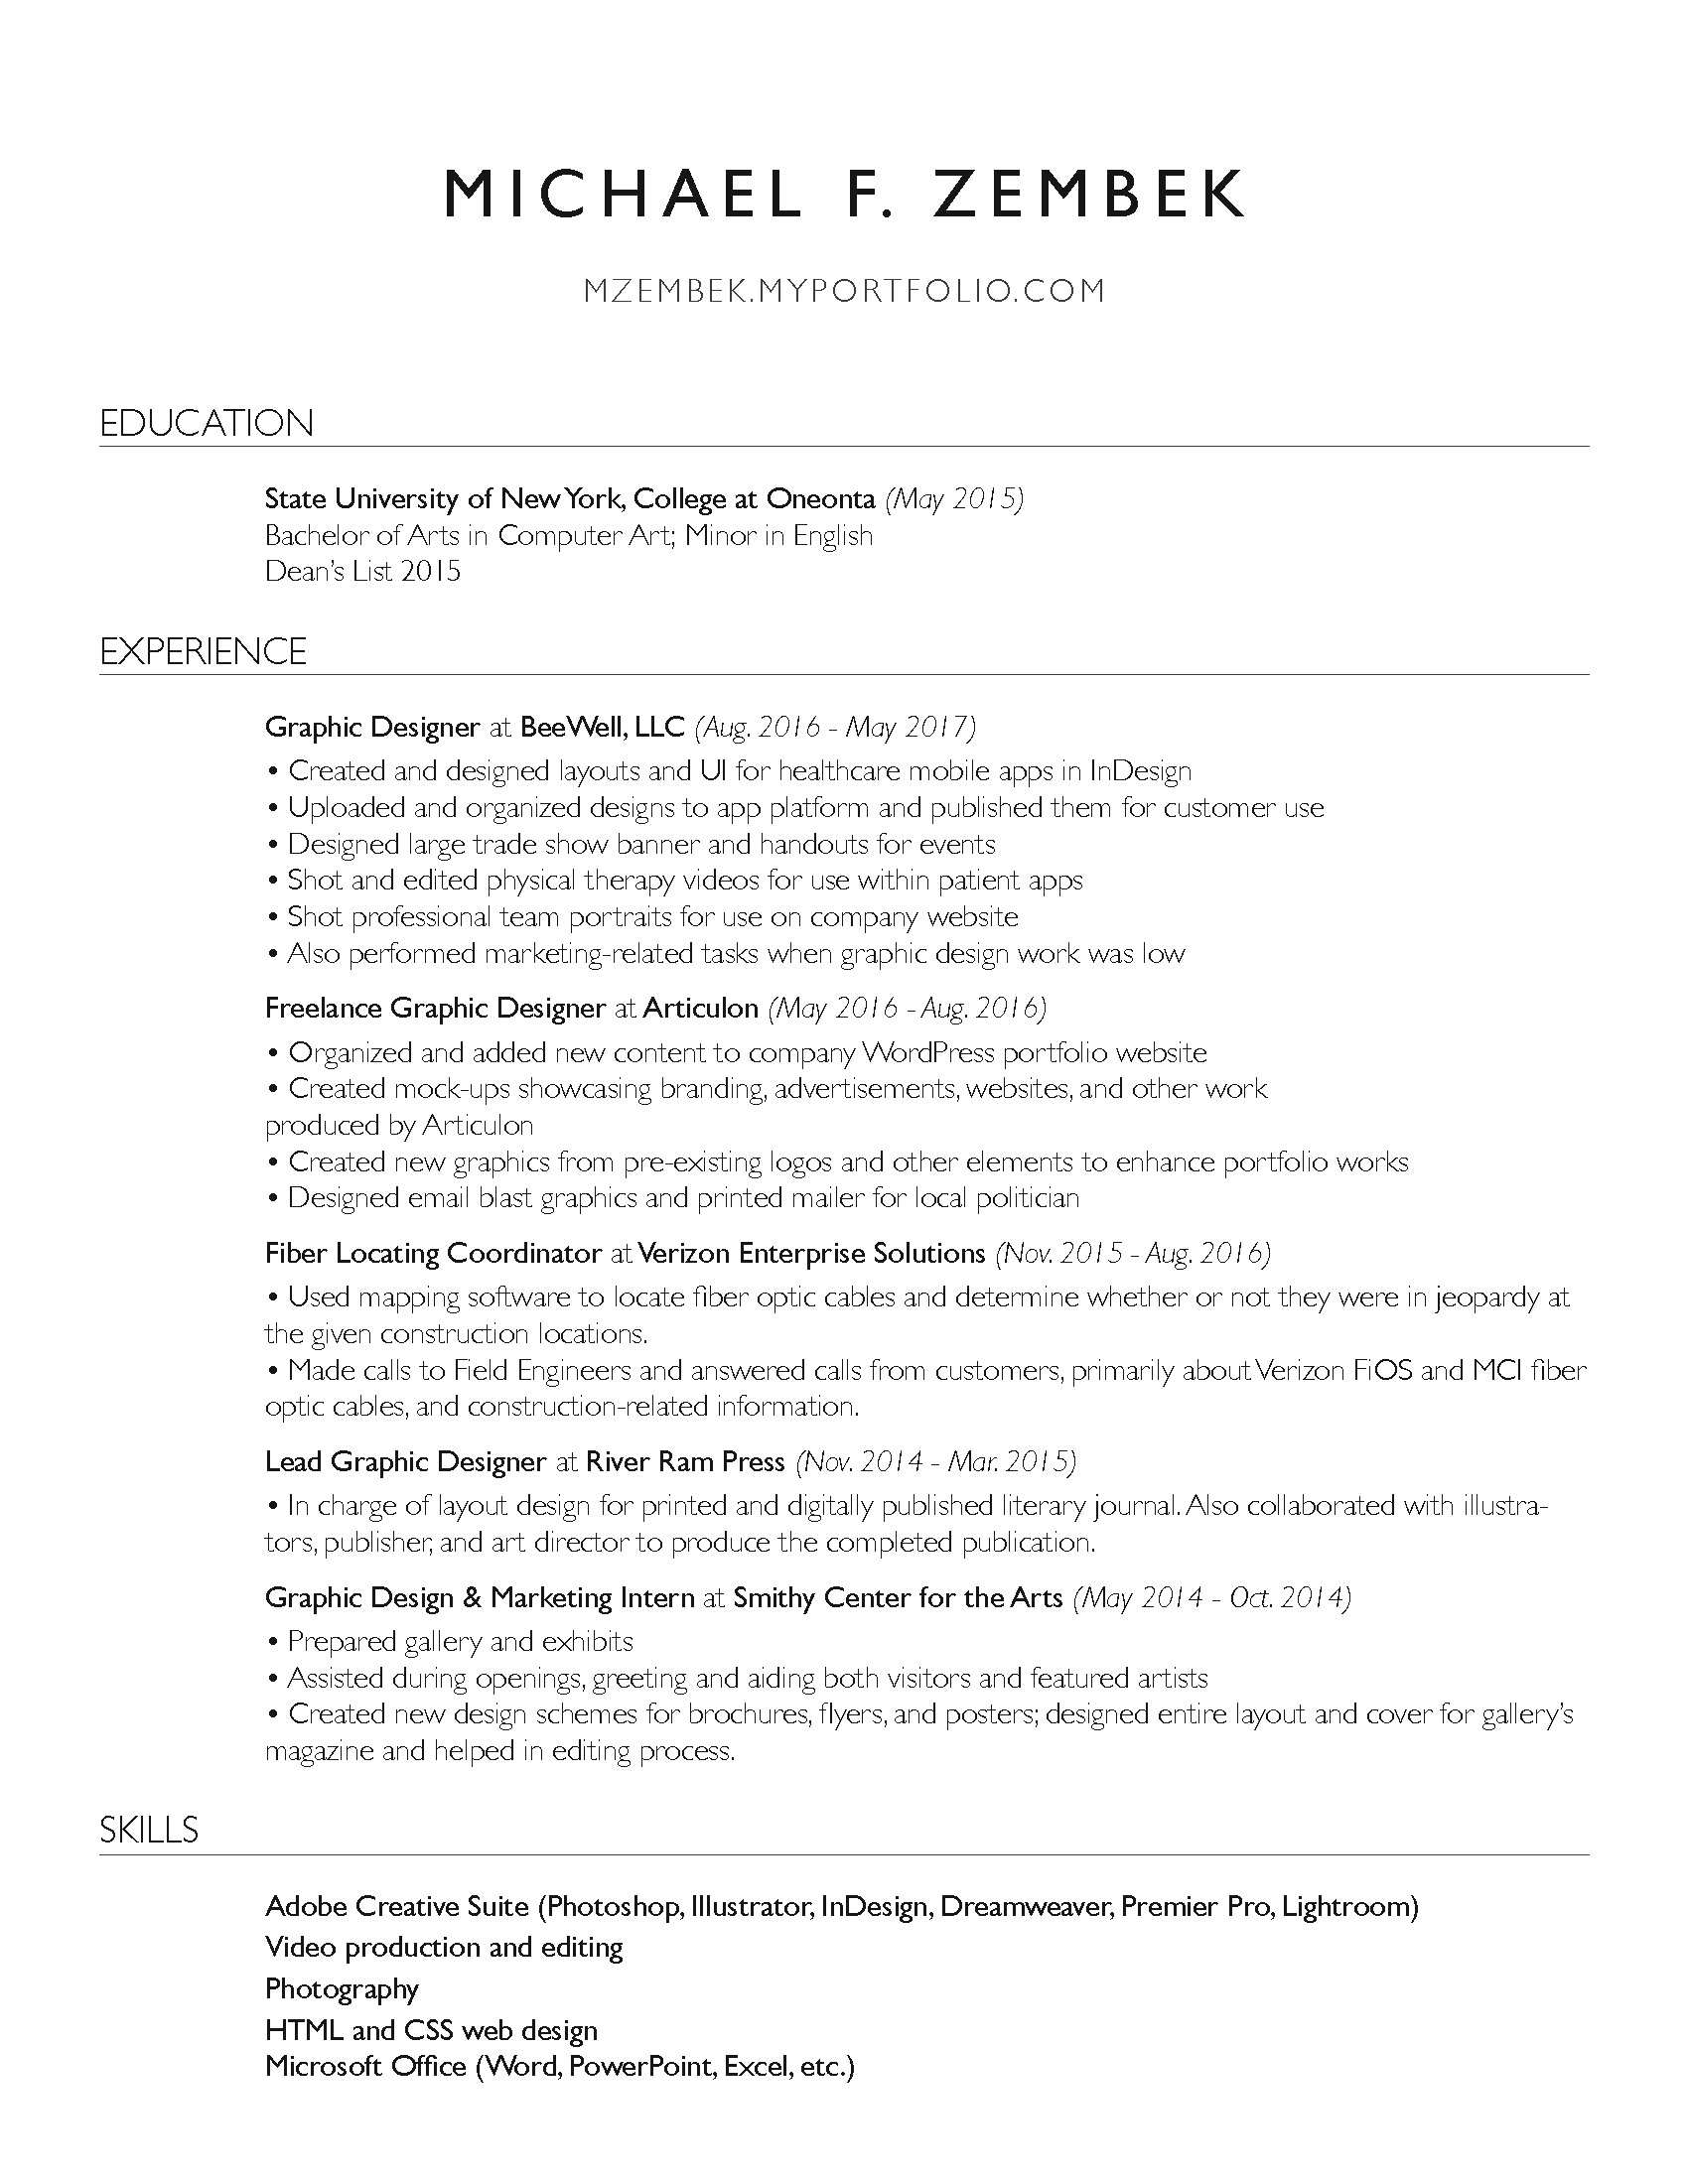 Police Officer Resume Objective Excel Michael Zembek  Graphic Designer Free Easy Resume Templates Excel with Software Developer Resume Template Resume Lpn Resume Sample